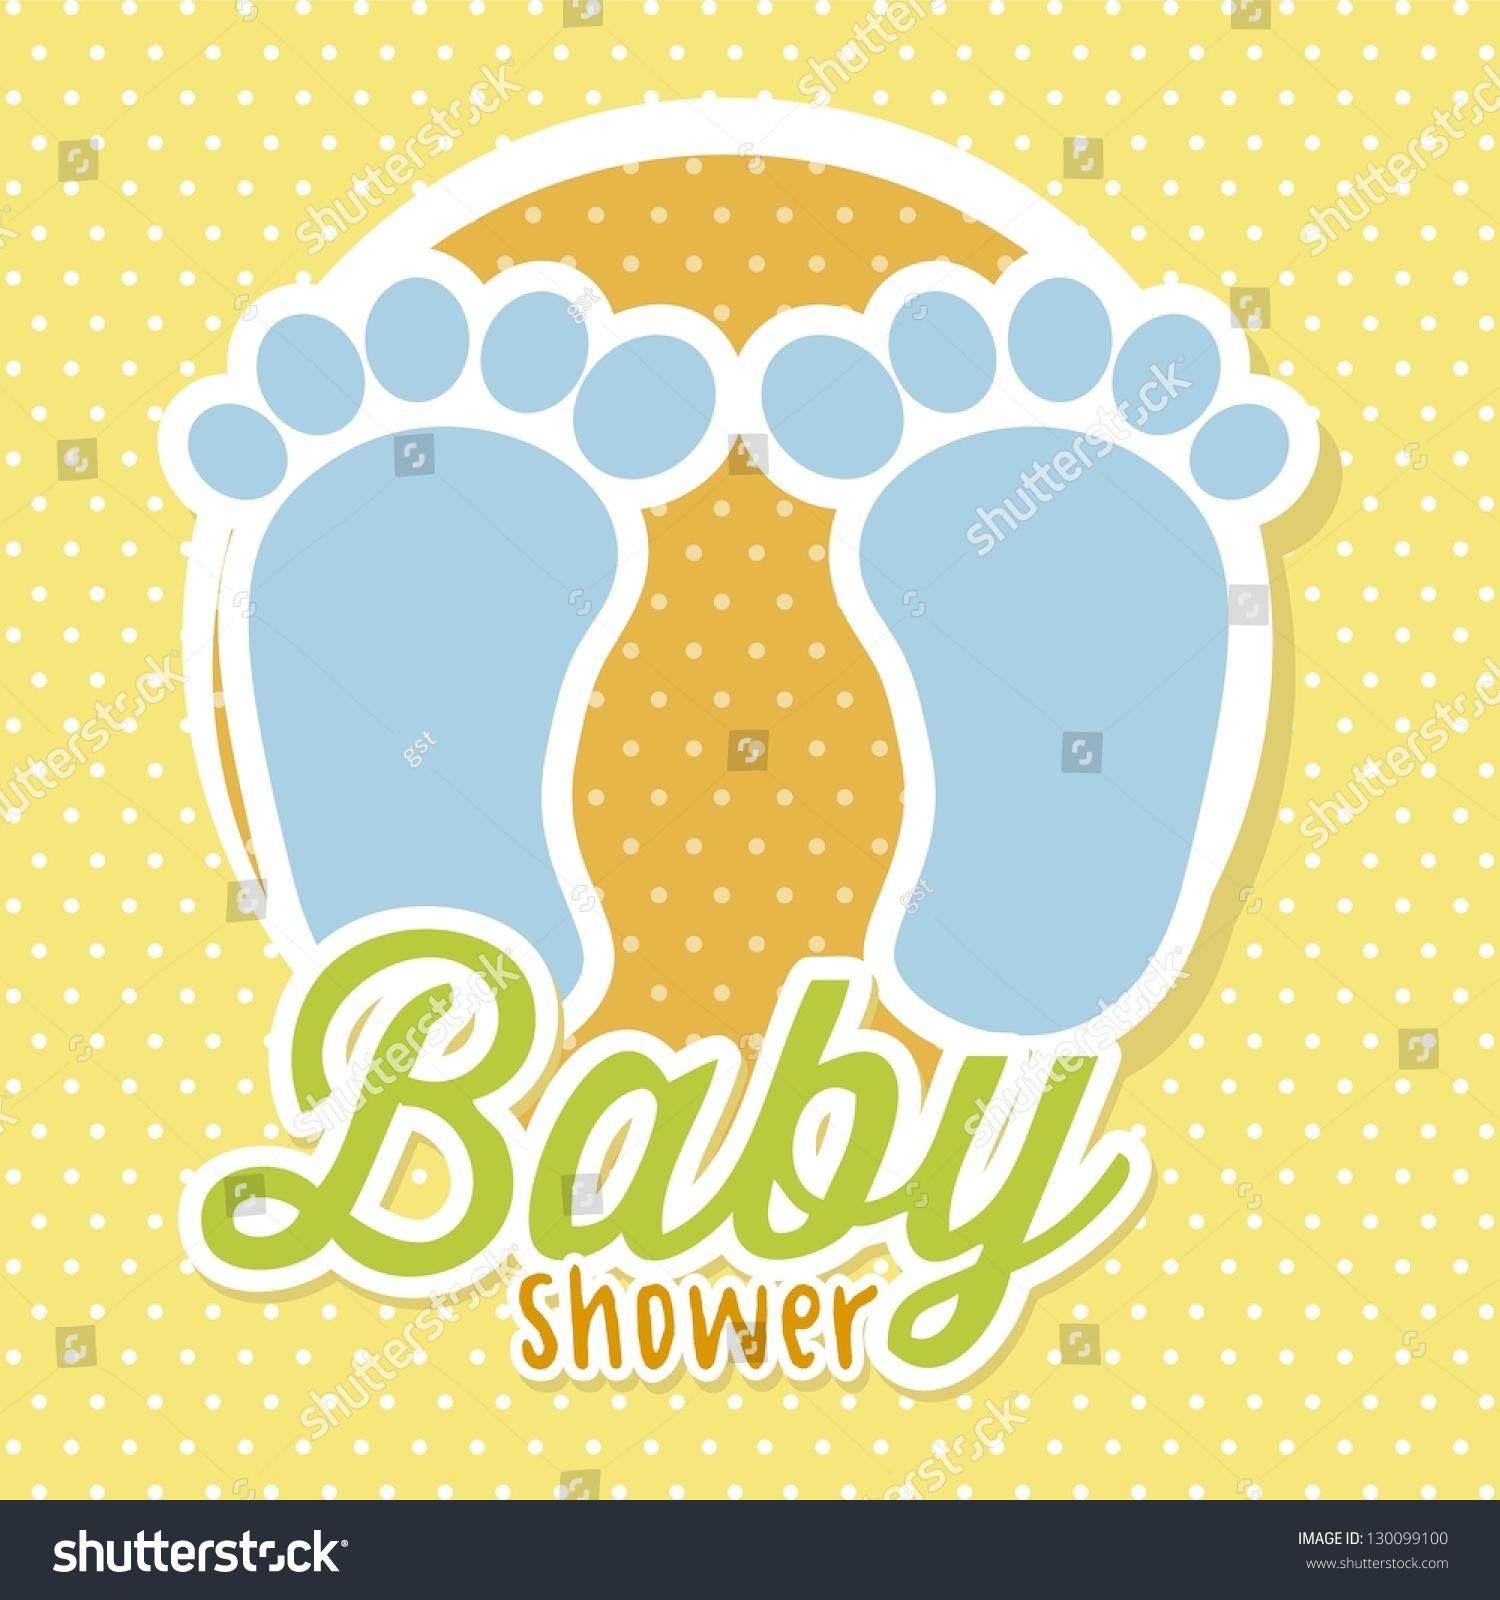 Yellow Baby Shower Background   www.imgkid.com - The Image ... Yellow Baby Shower Background